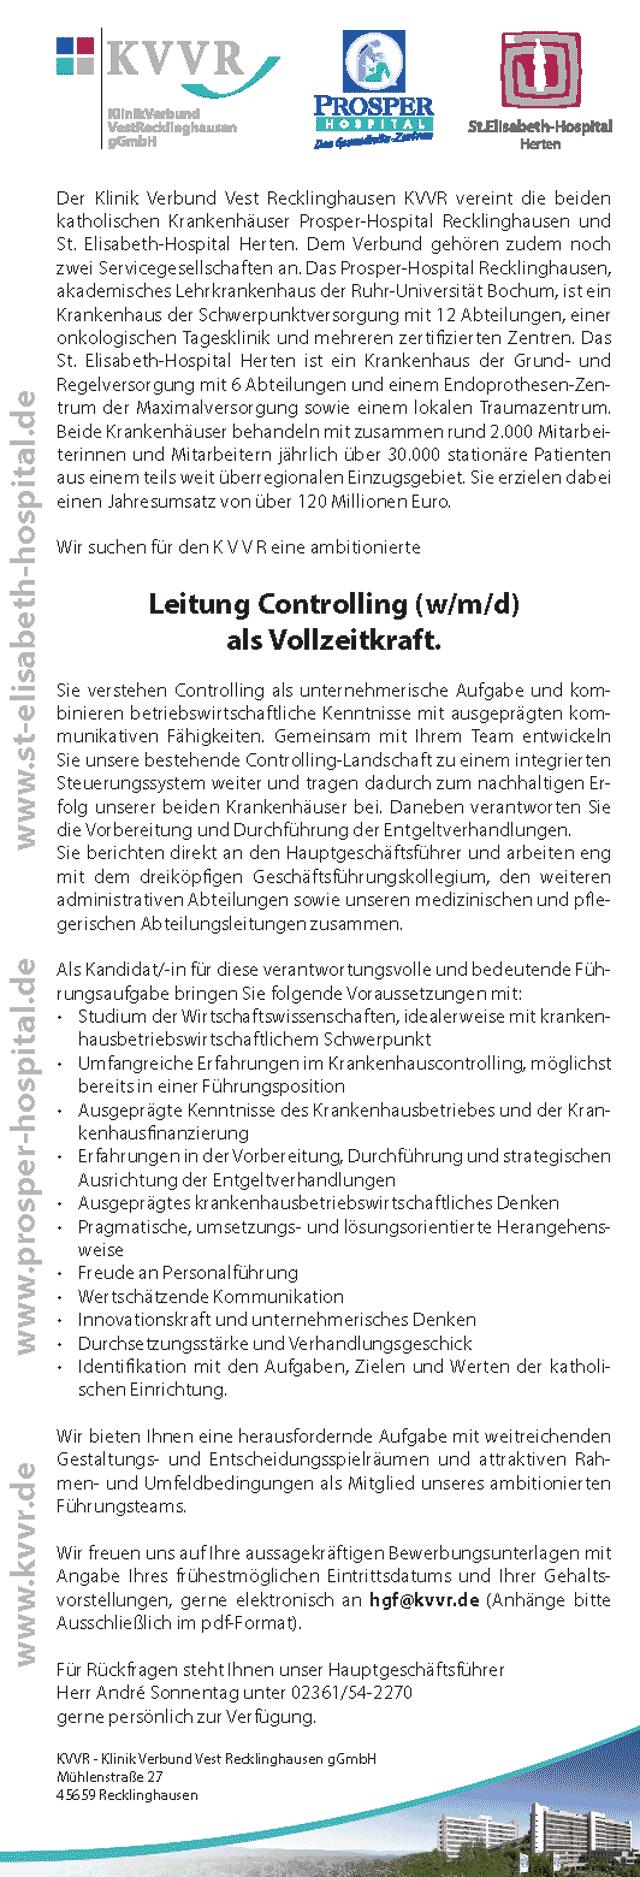 Klinik Verbund Vest Recklinghausen gGmbH: Leitung Controlling (w/m/d)